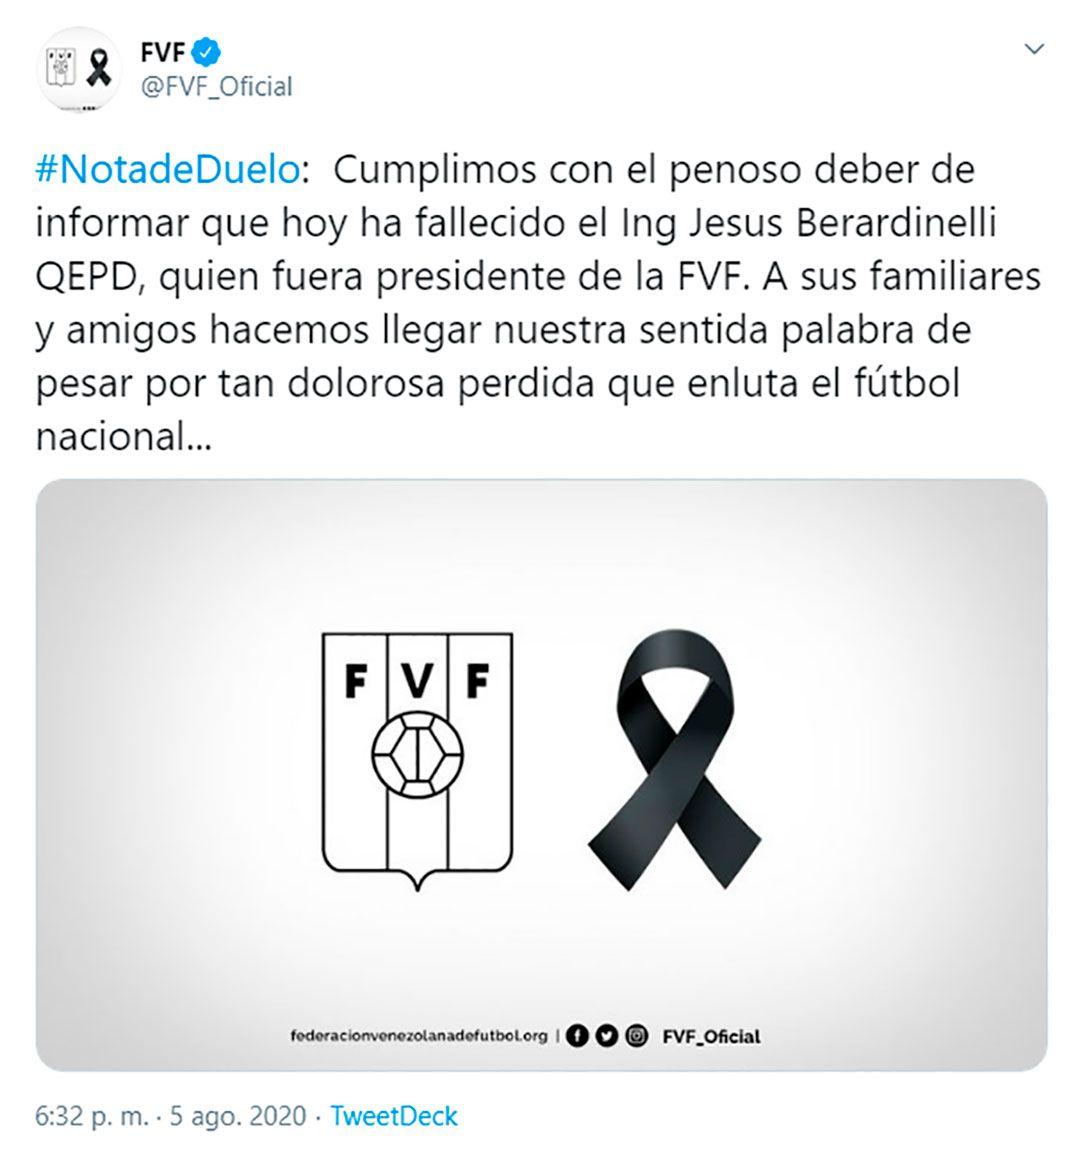 Federacion venezolana de fútbol jesus berardinelli